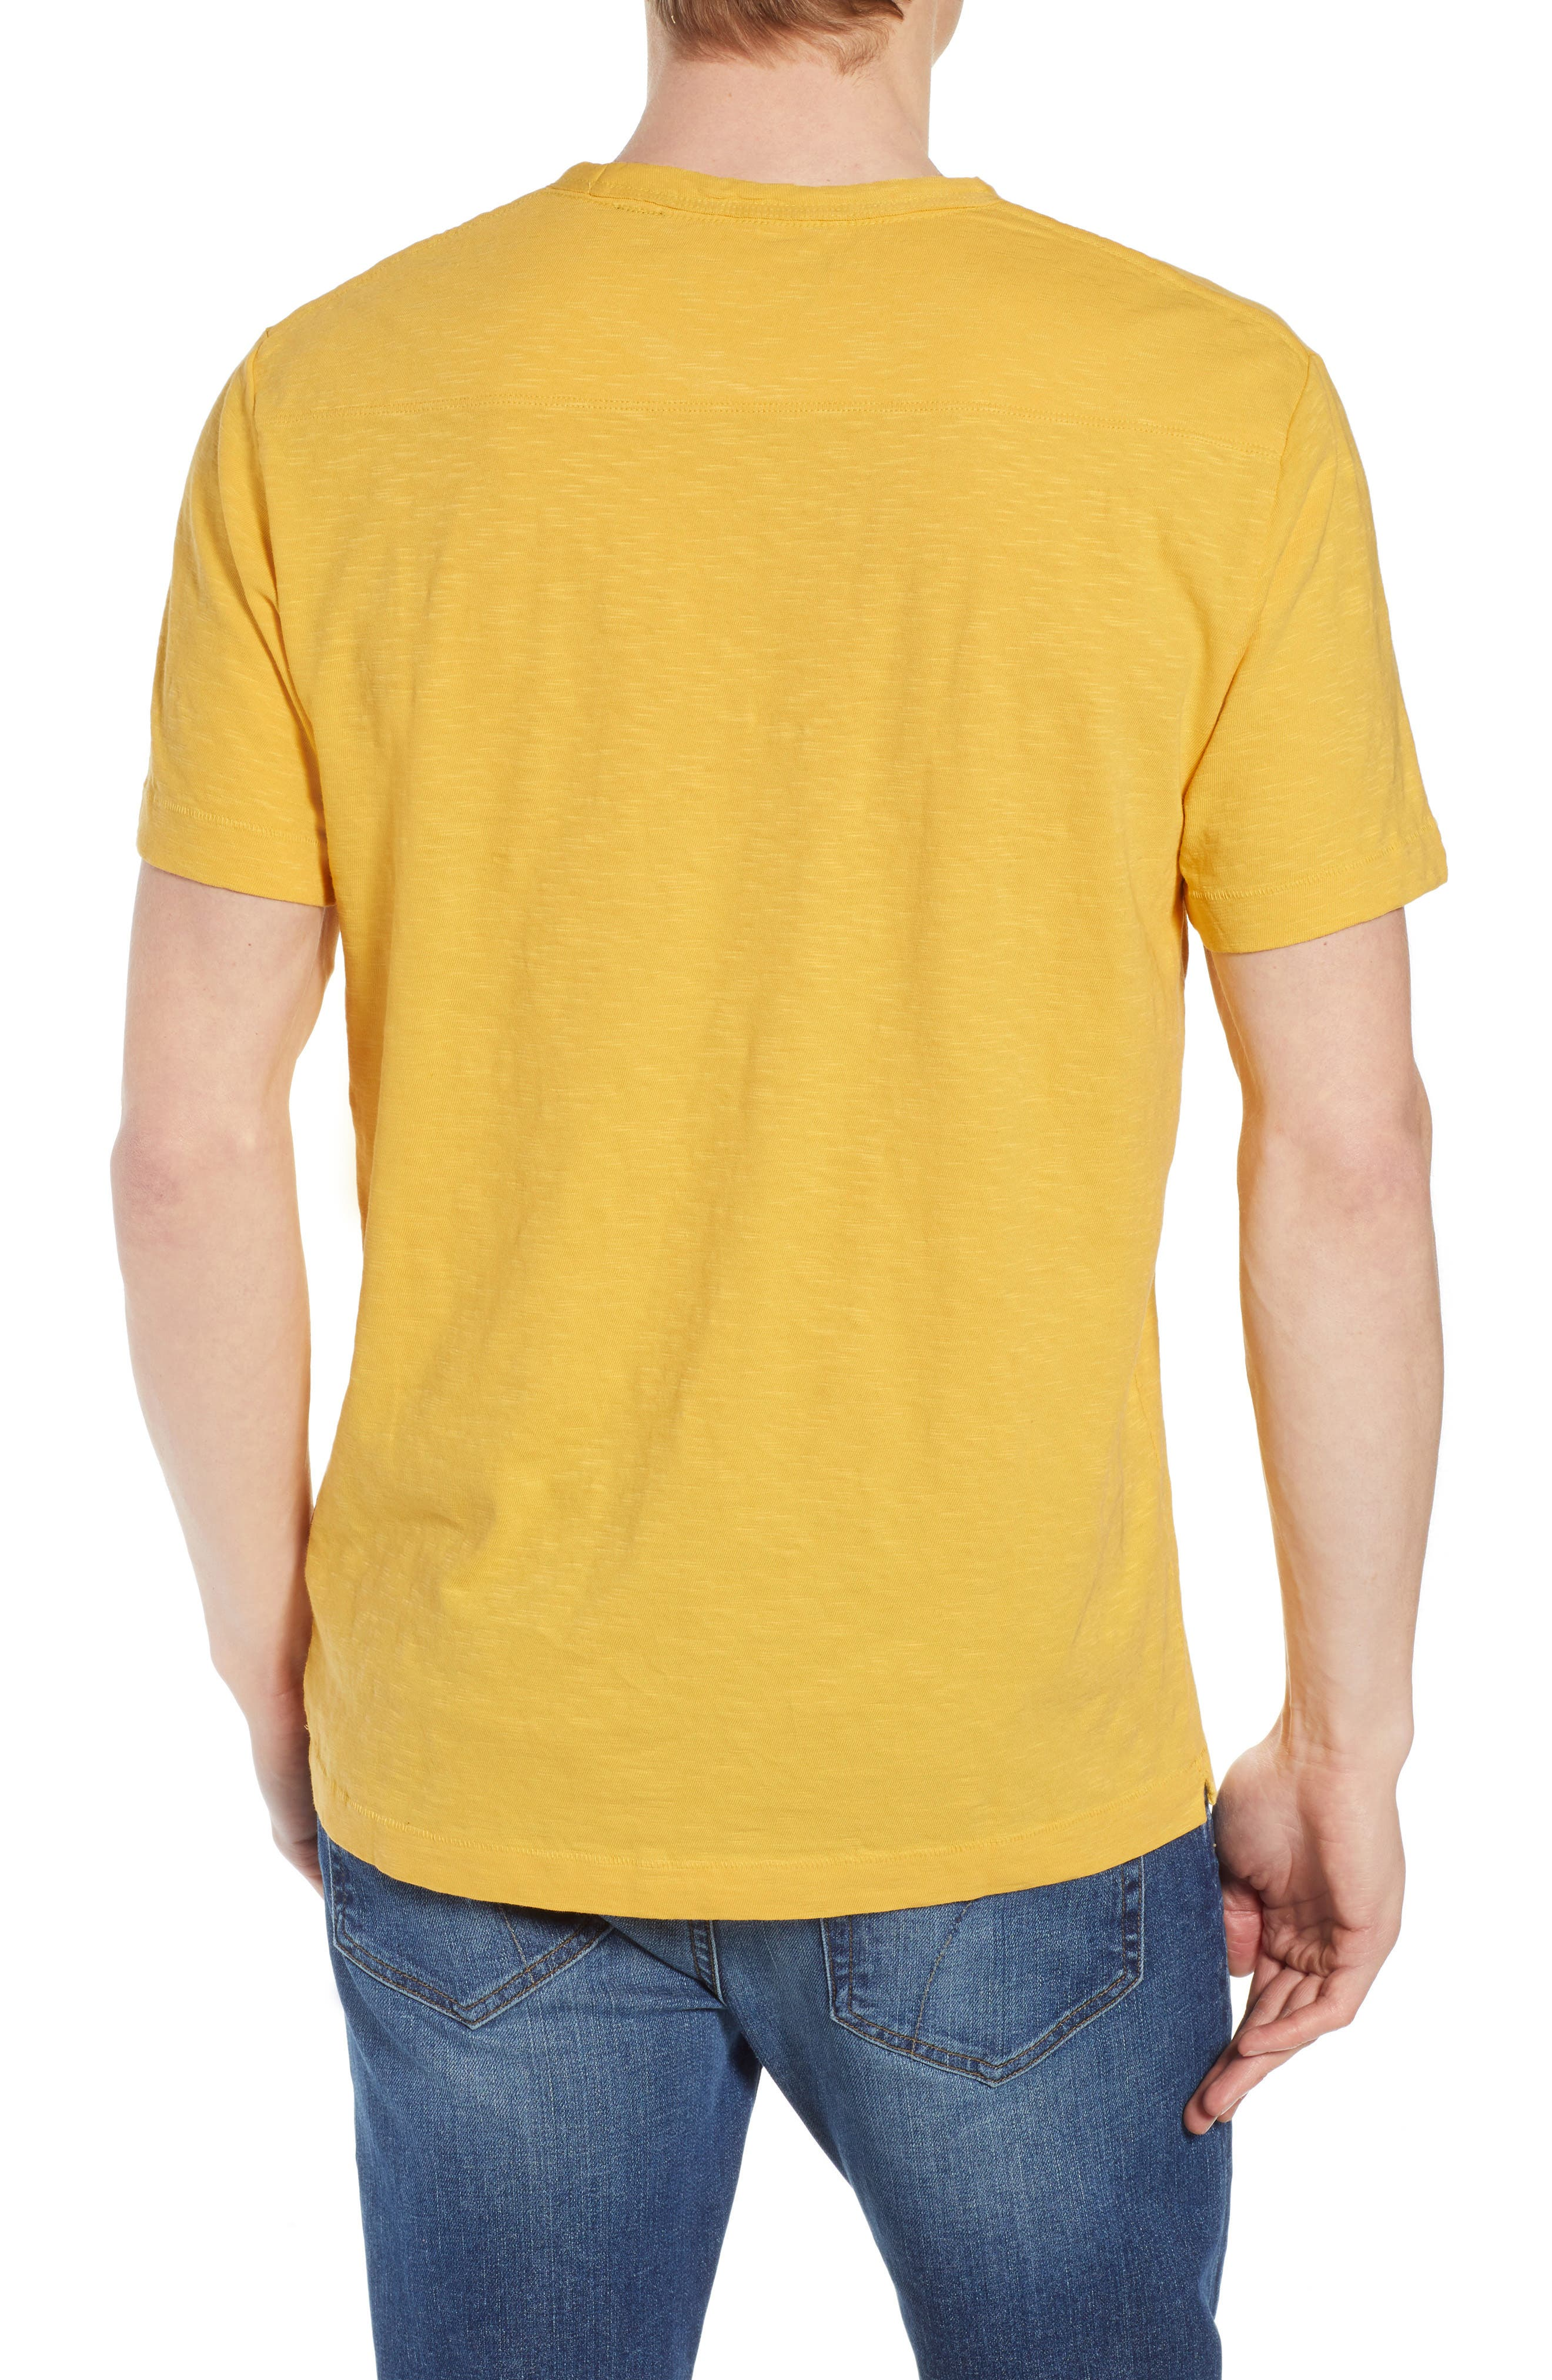 Soleil T-Shirt,                             Alternate thumbnail 2, color,                             Banana